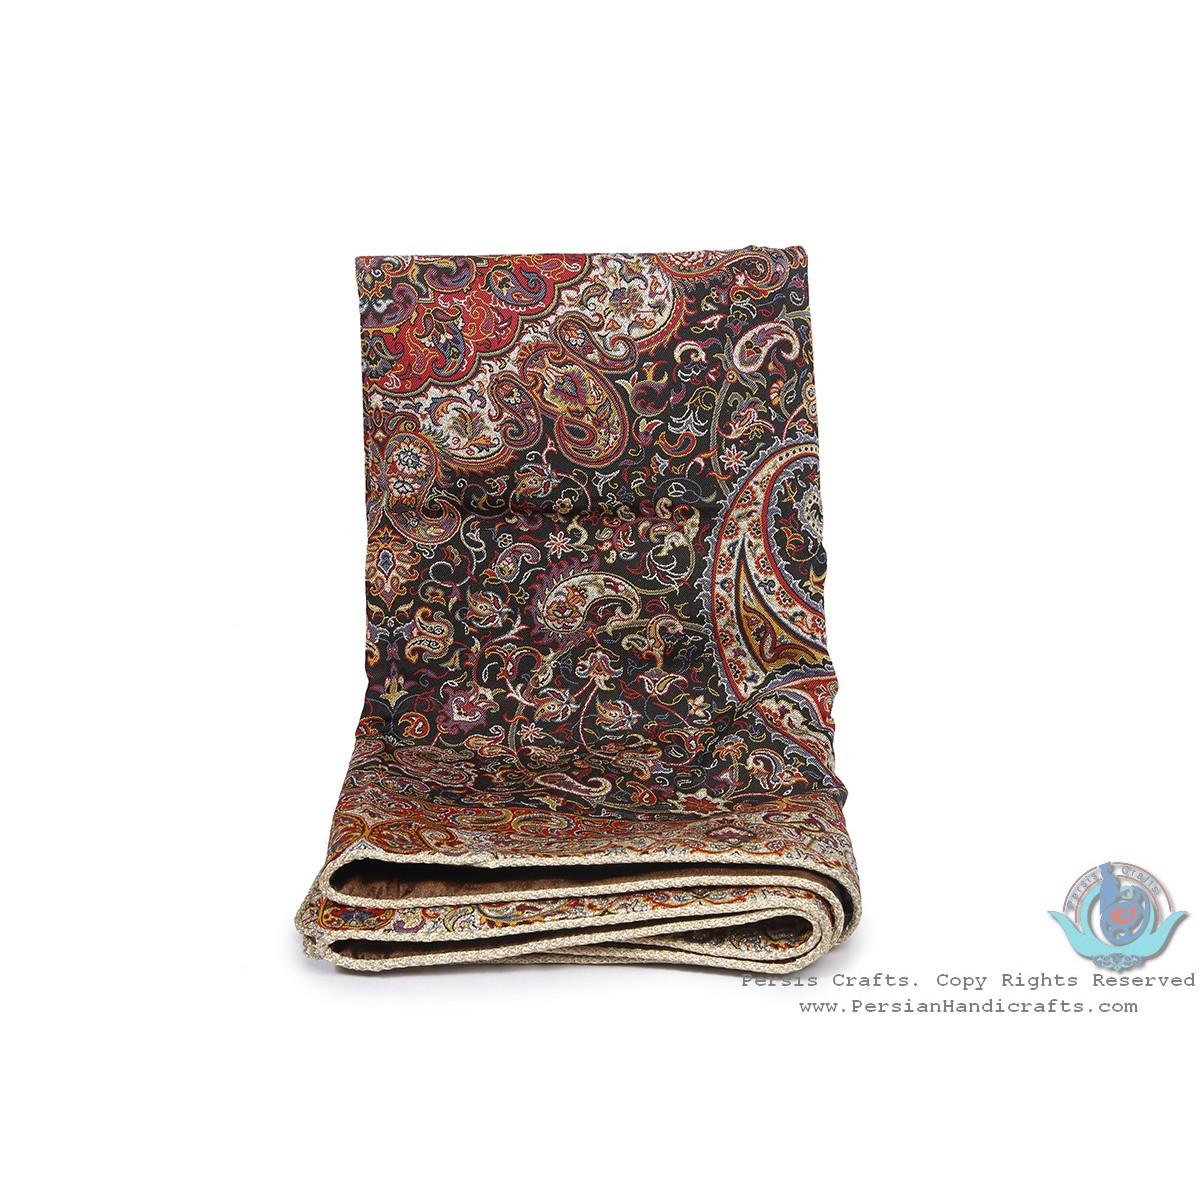 Privileged Termeh Paisly & Toranj Design Tablecloth - HT3905-Persian Handicrafts